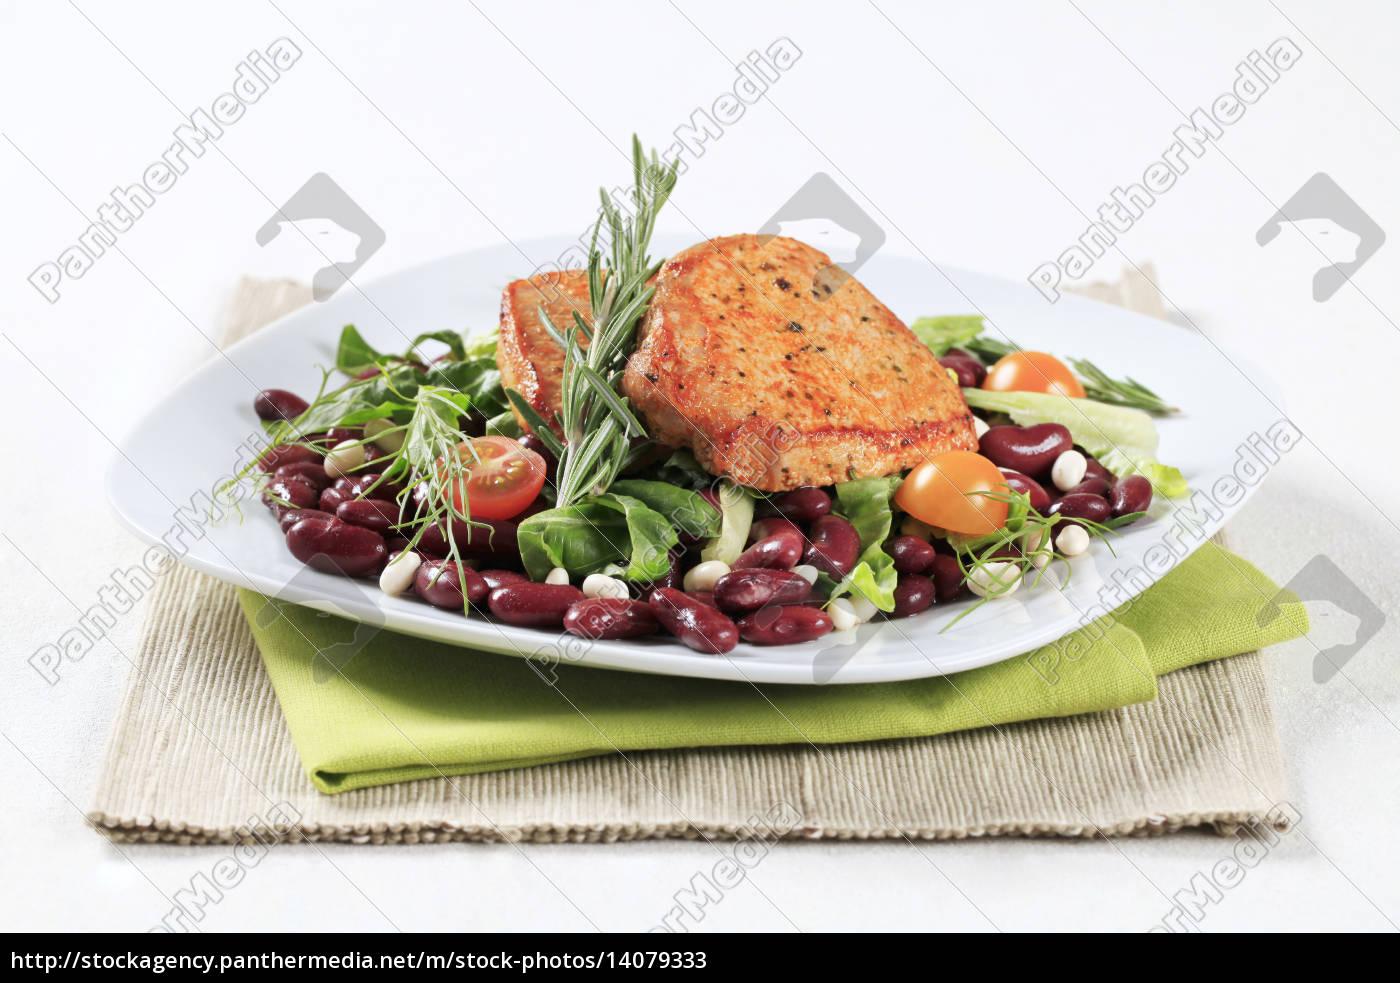 marinated, pork, and, red, bean, salad - 14079333